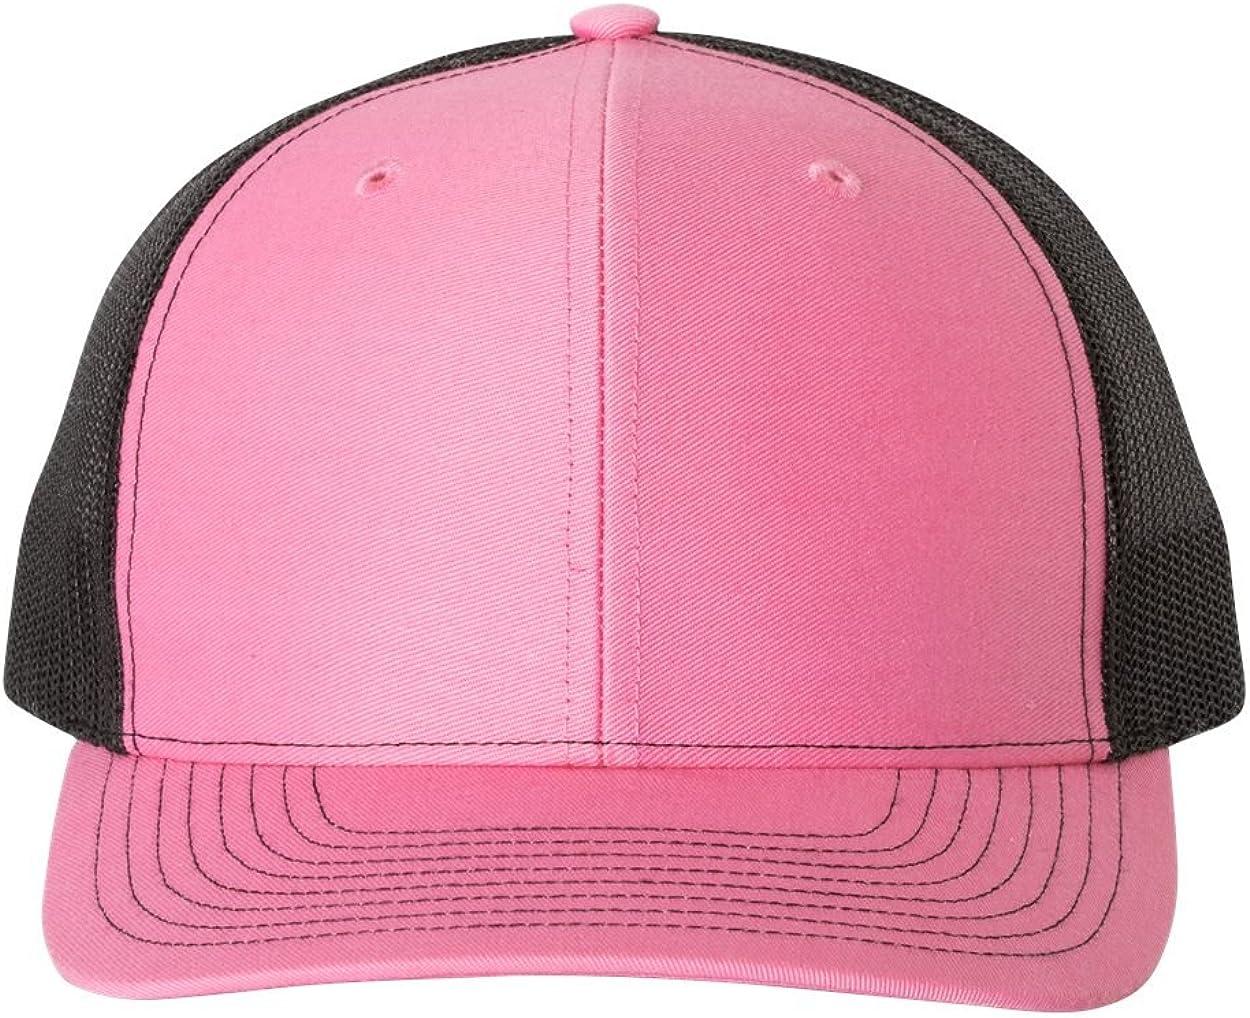 RICHARDSON - Adjustable Snapback Trucker Cap - 112 - OSFM - Hot Pink/Black